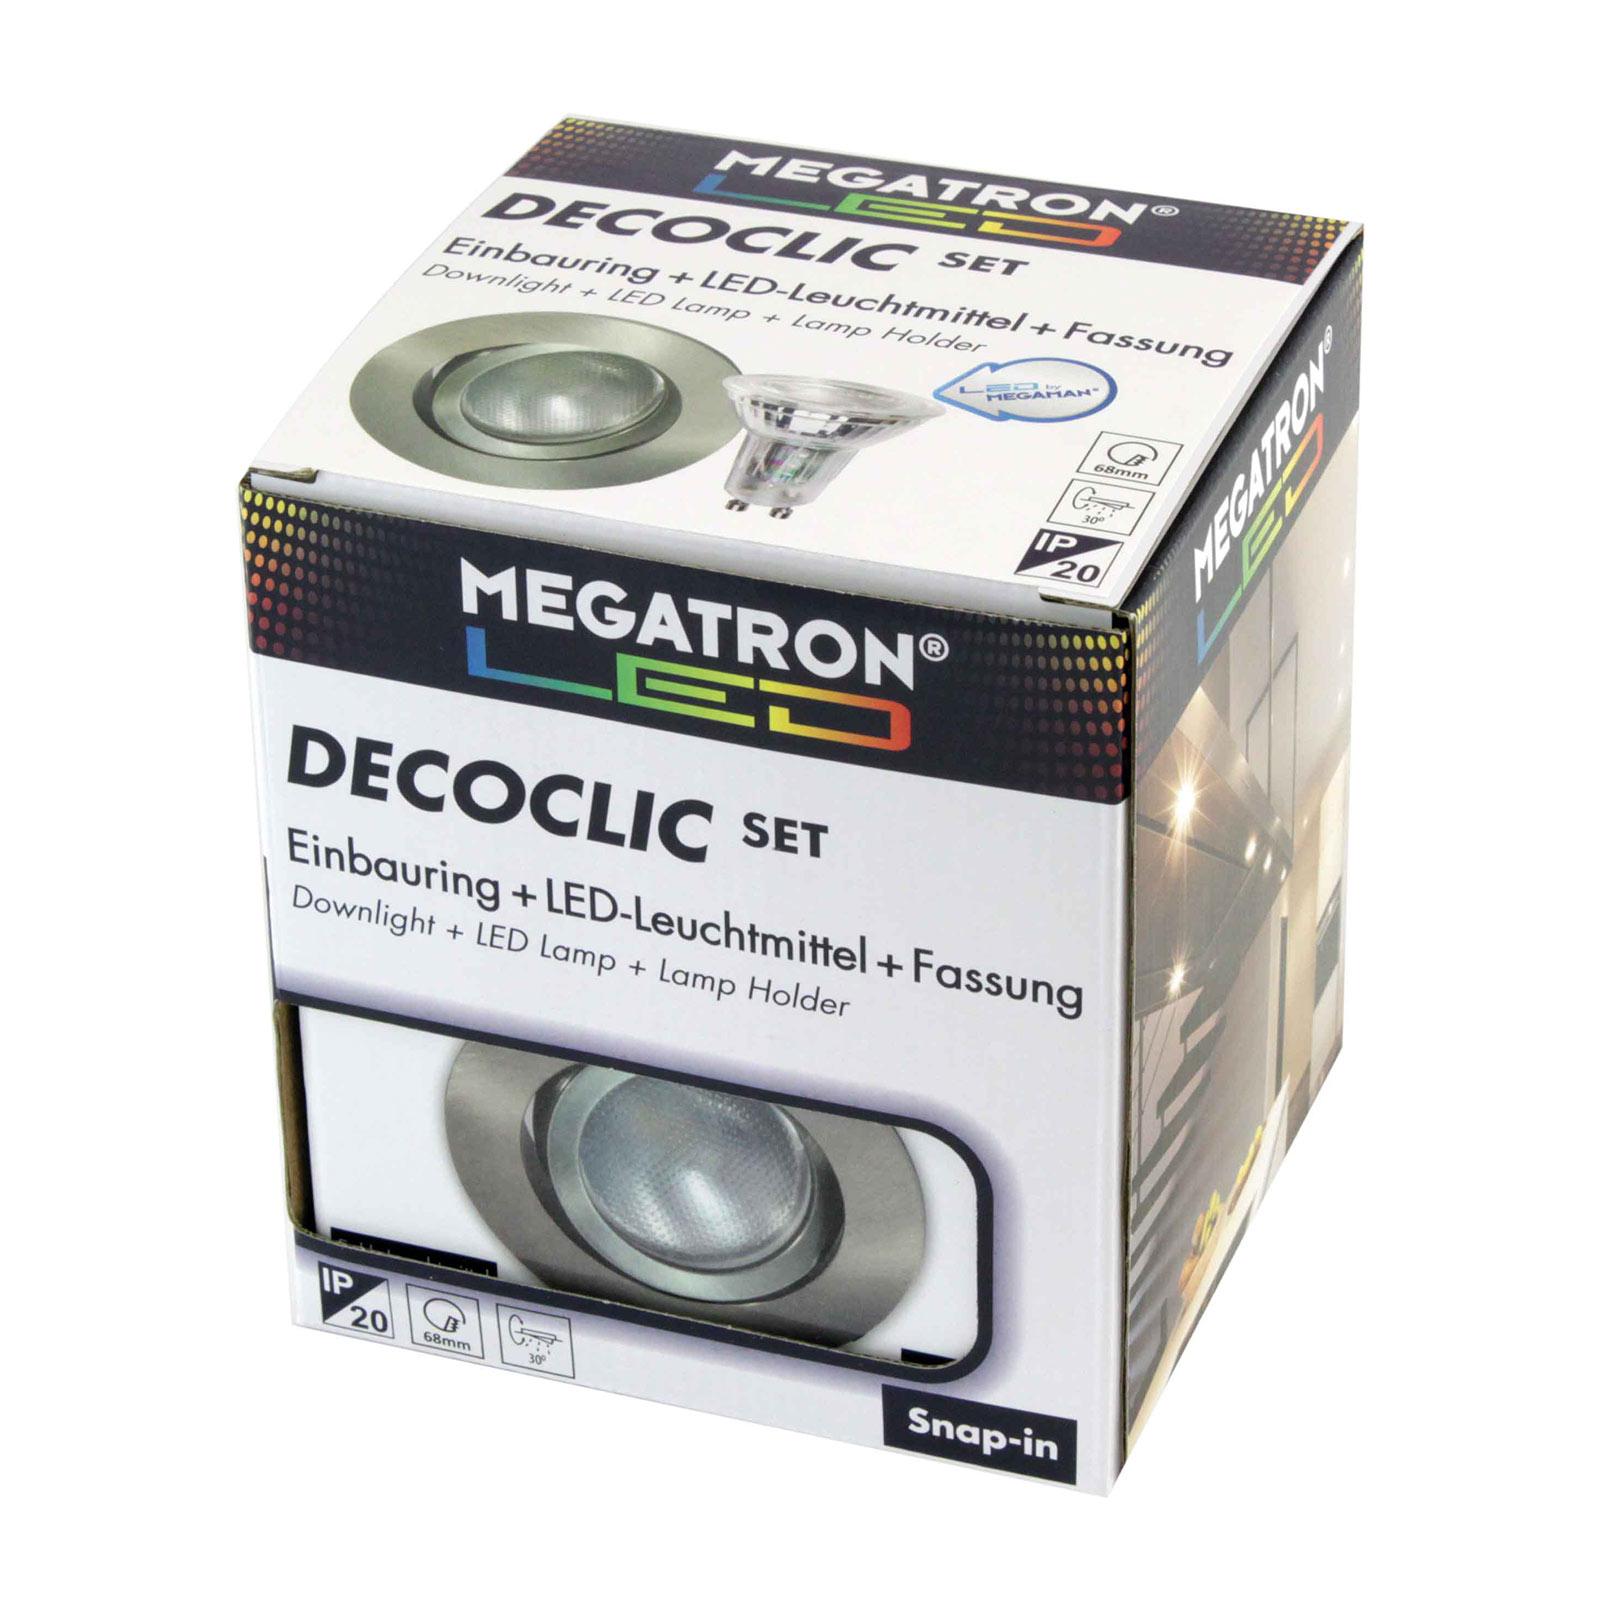 Decoclic LED-indbygningsspot set GU10 4,5 W, jern